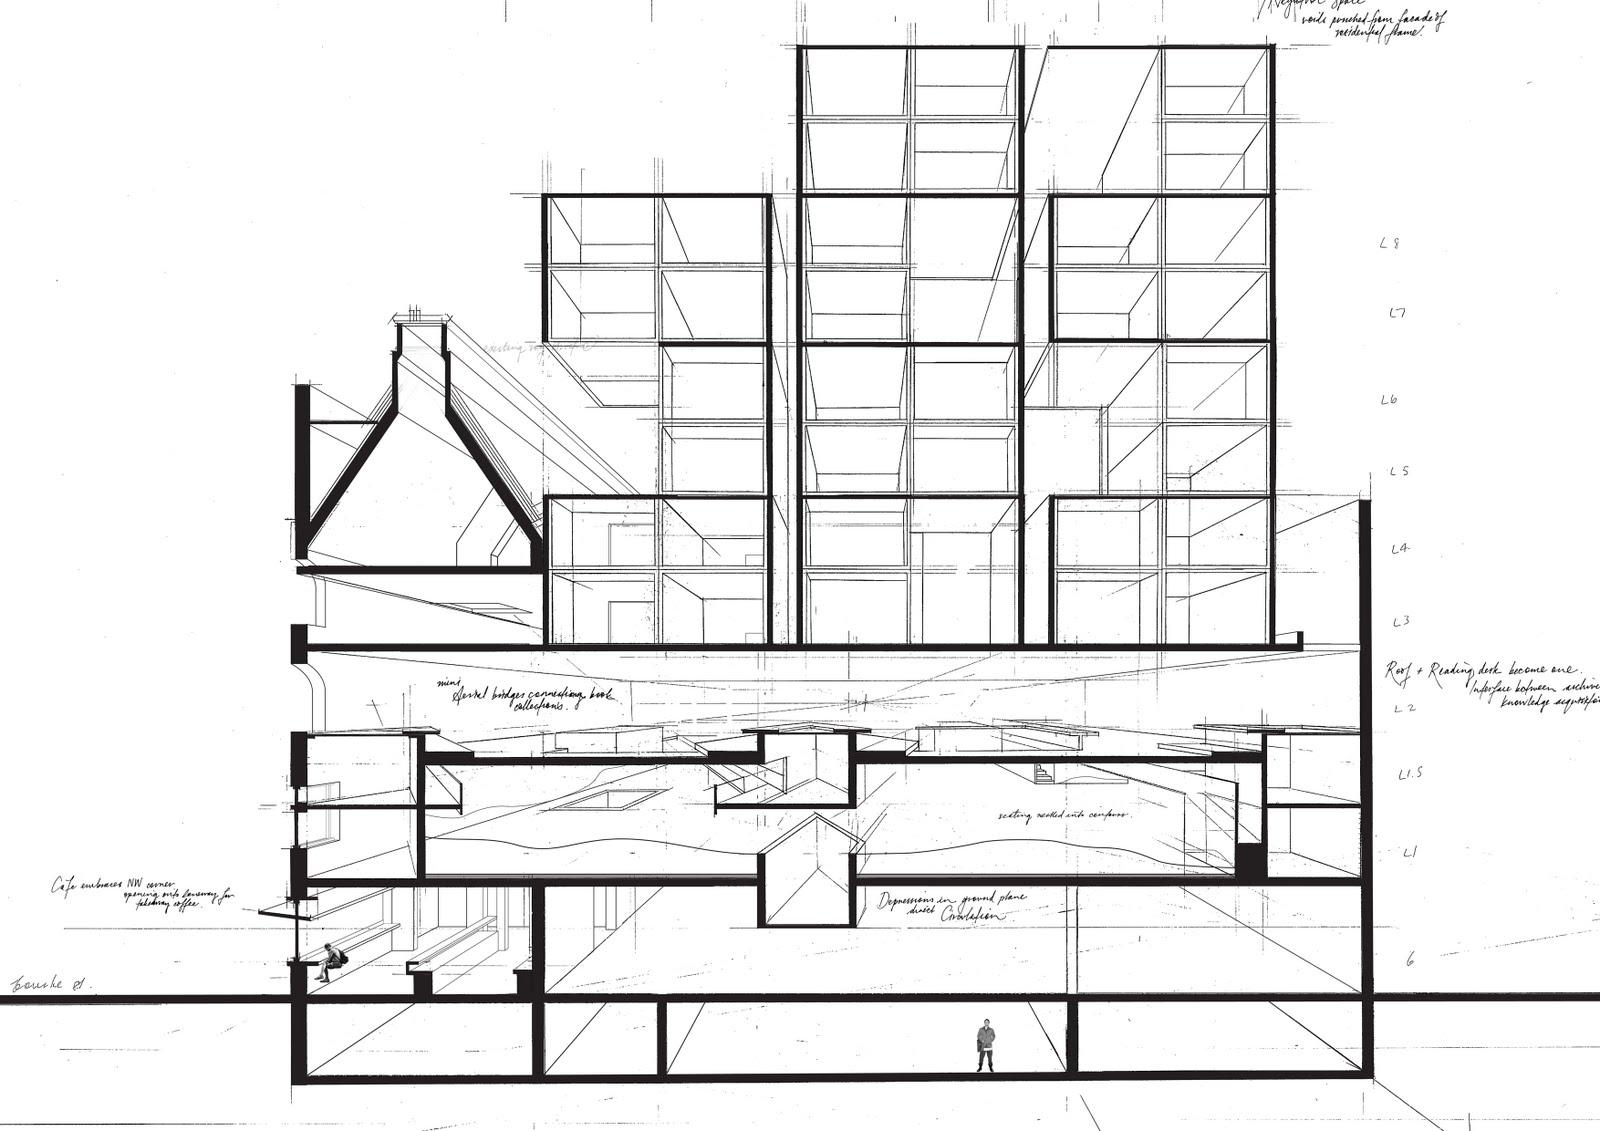 12 weeks 1 design: 040 basic presentation drawings